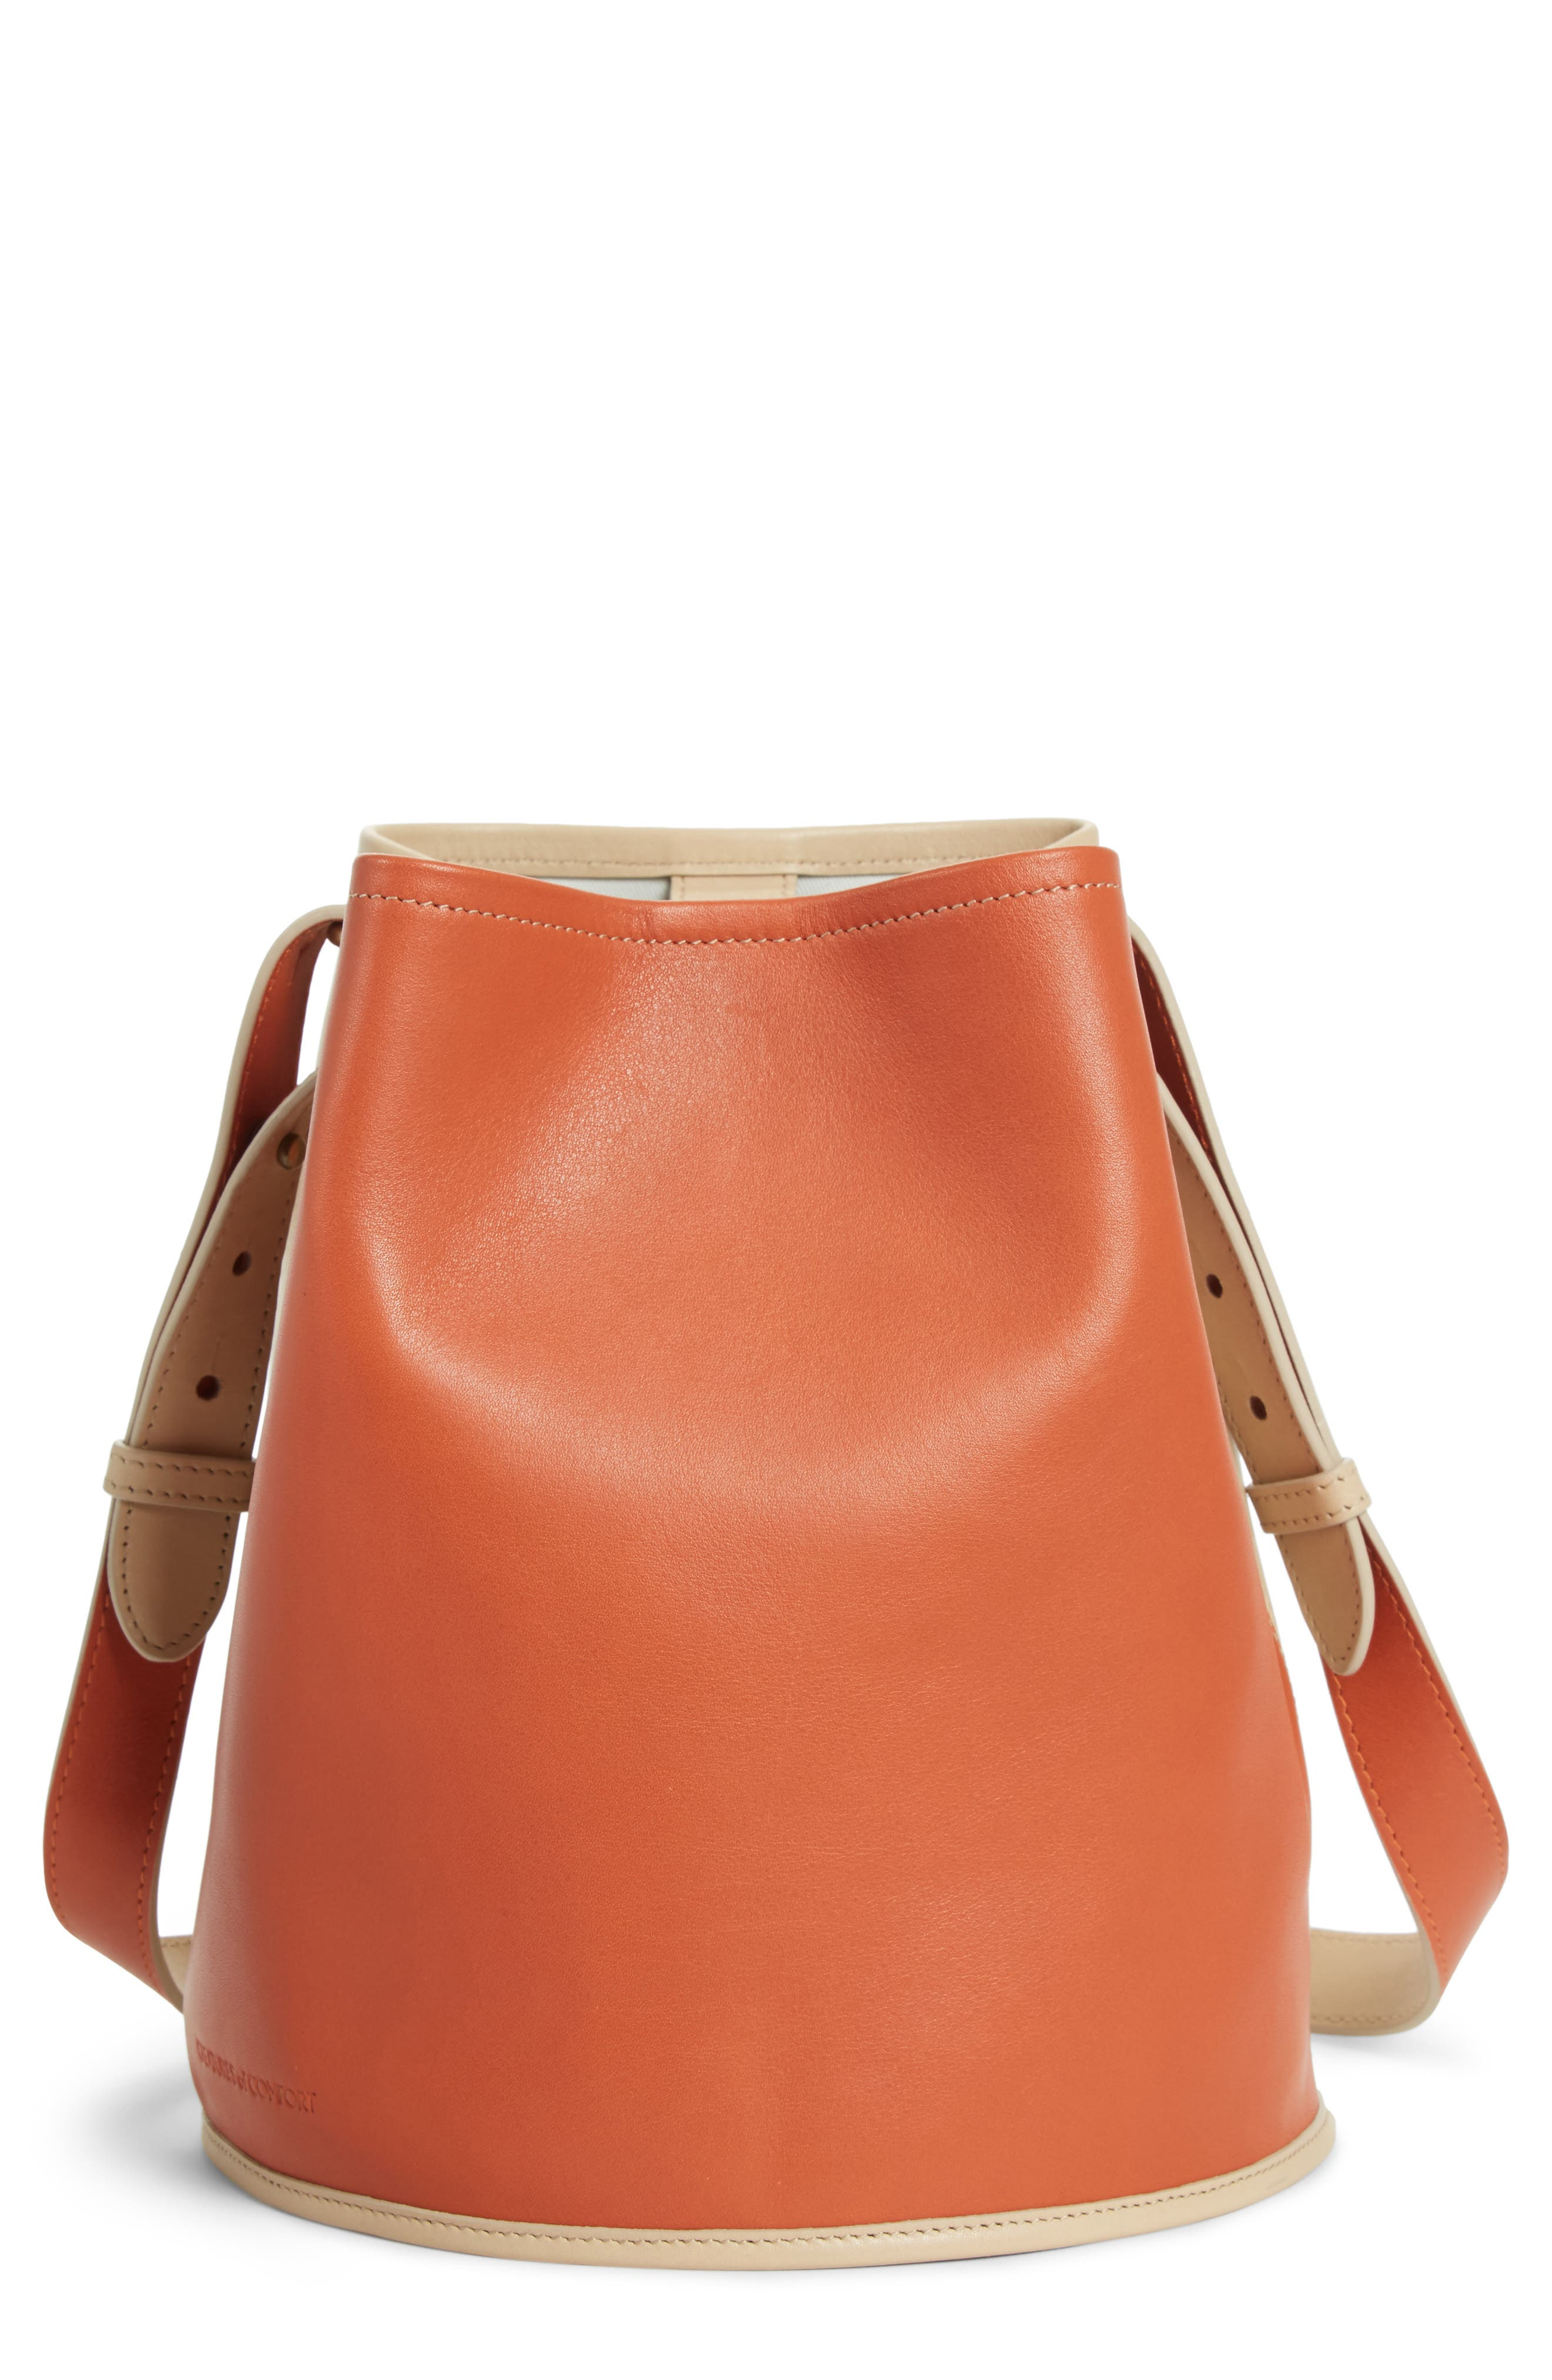 Small Bucket Bicolor Leather Bag,                         Main,                         color, Clove/ Cappuccino